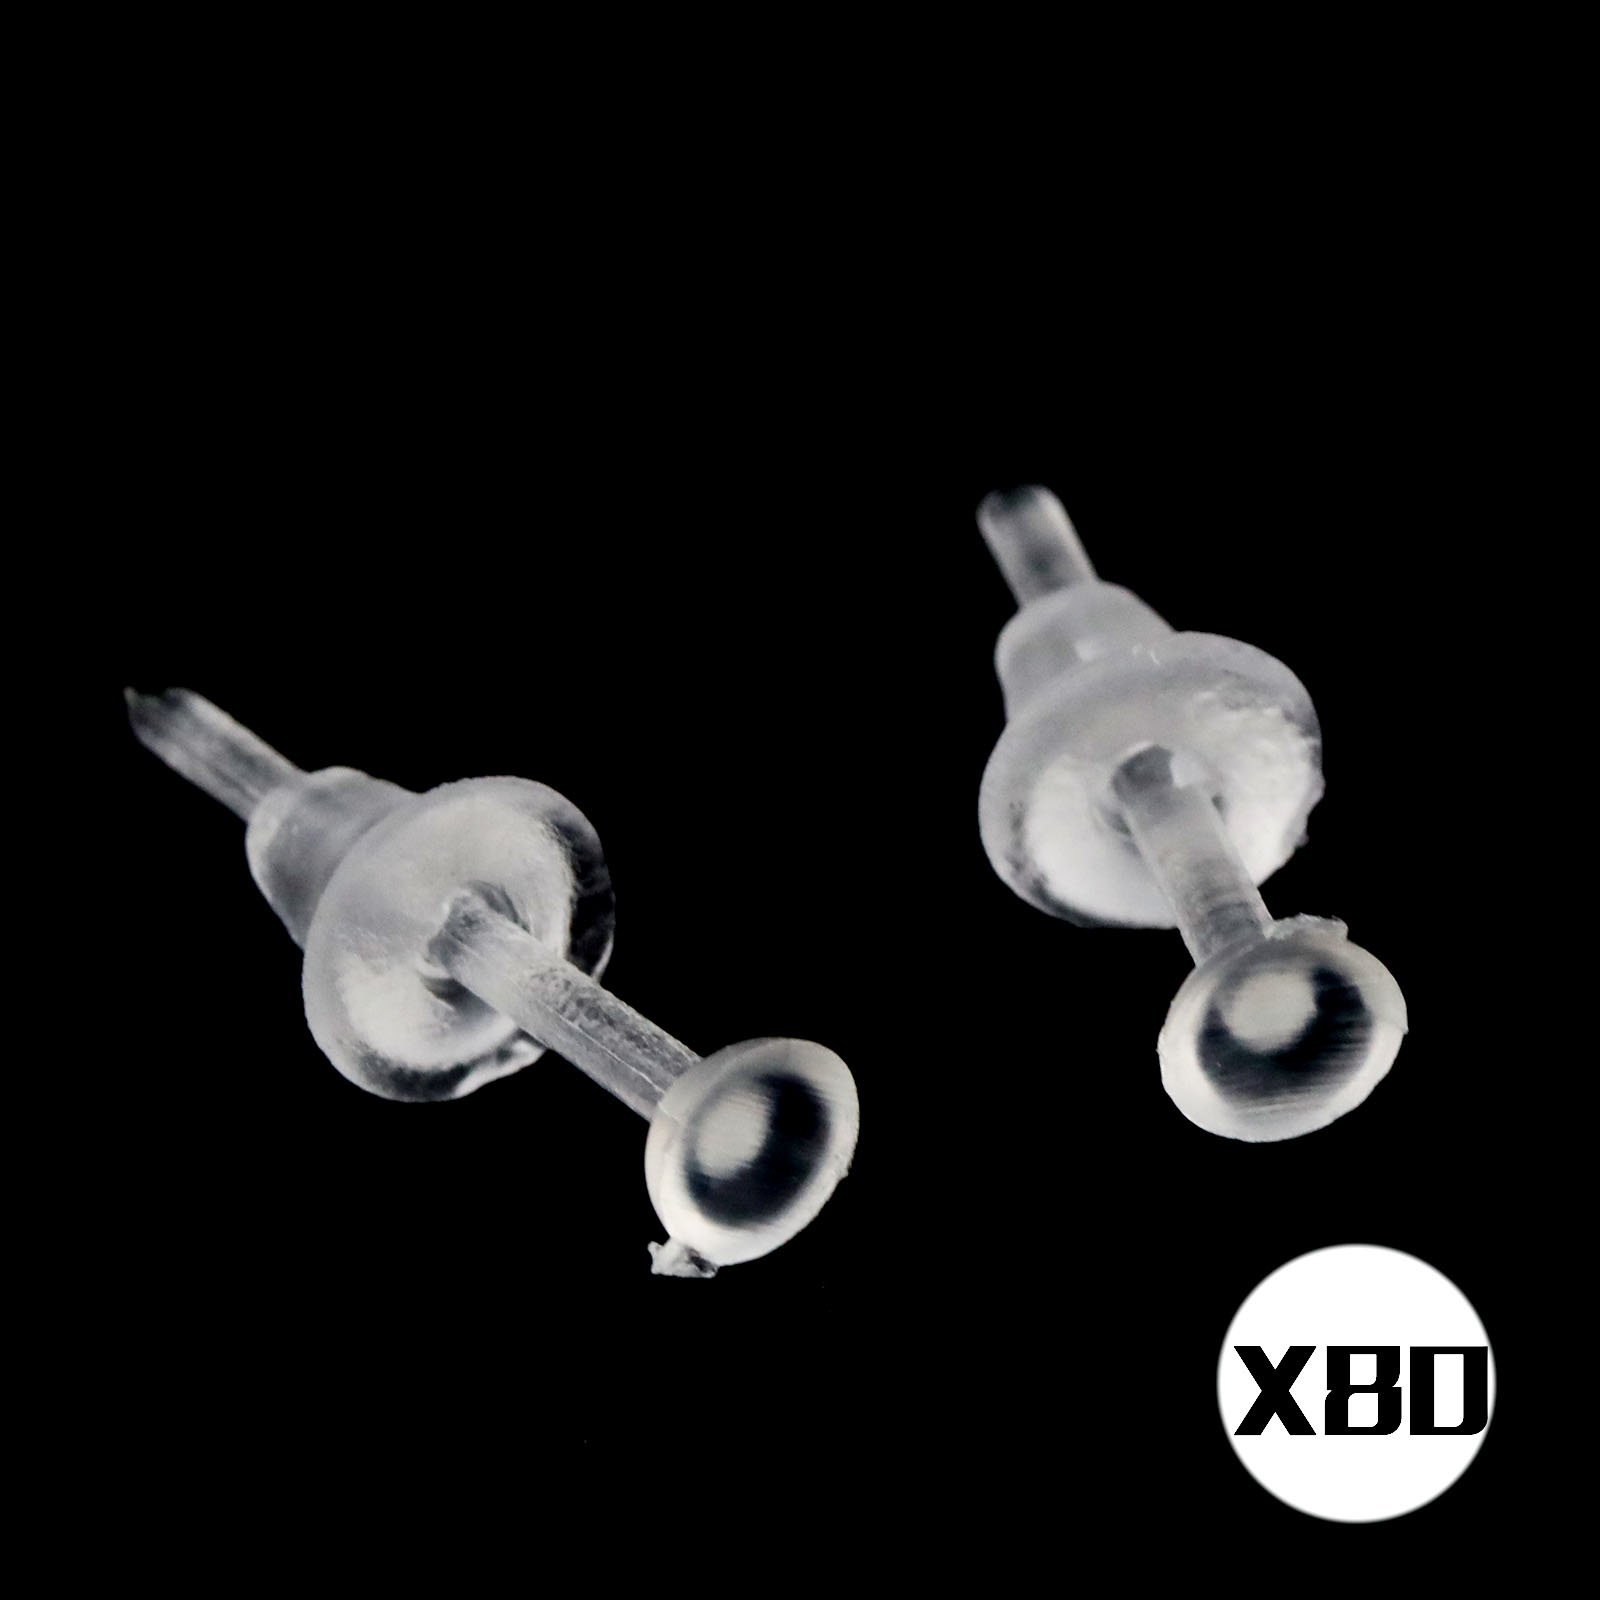 Allergy Free Transpa Plastic Earrings Stud Clear Stem Resin Back 10 20 50